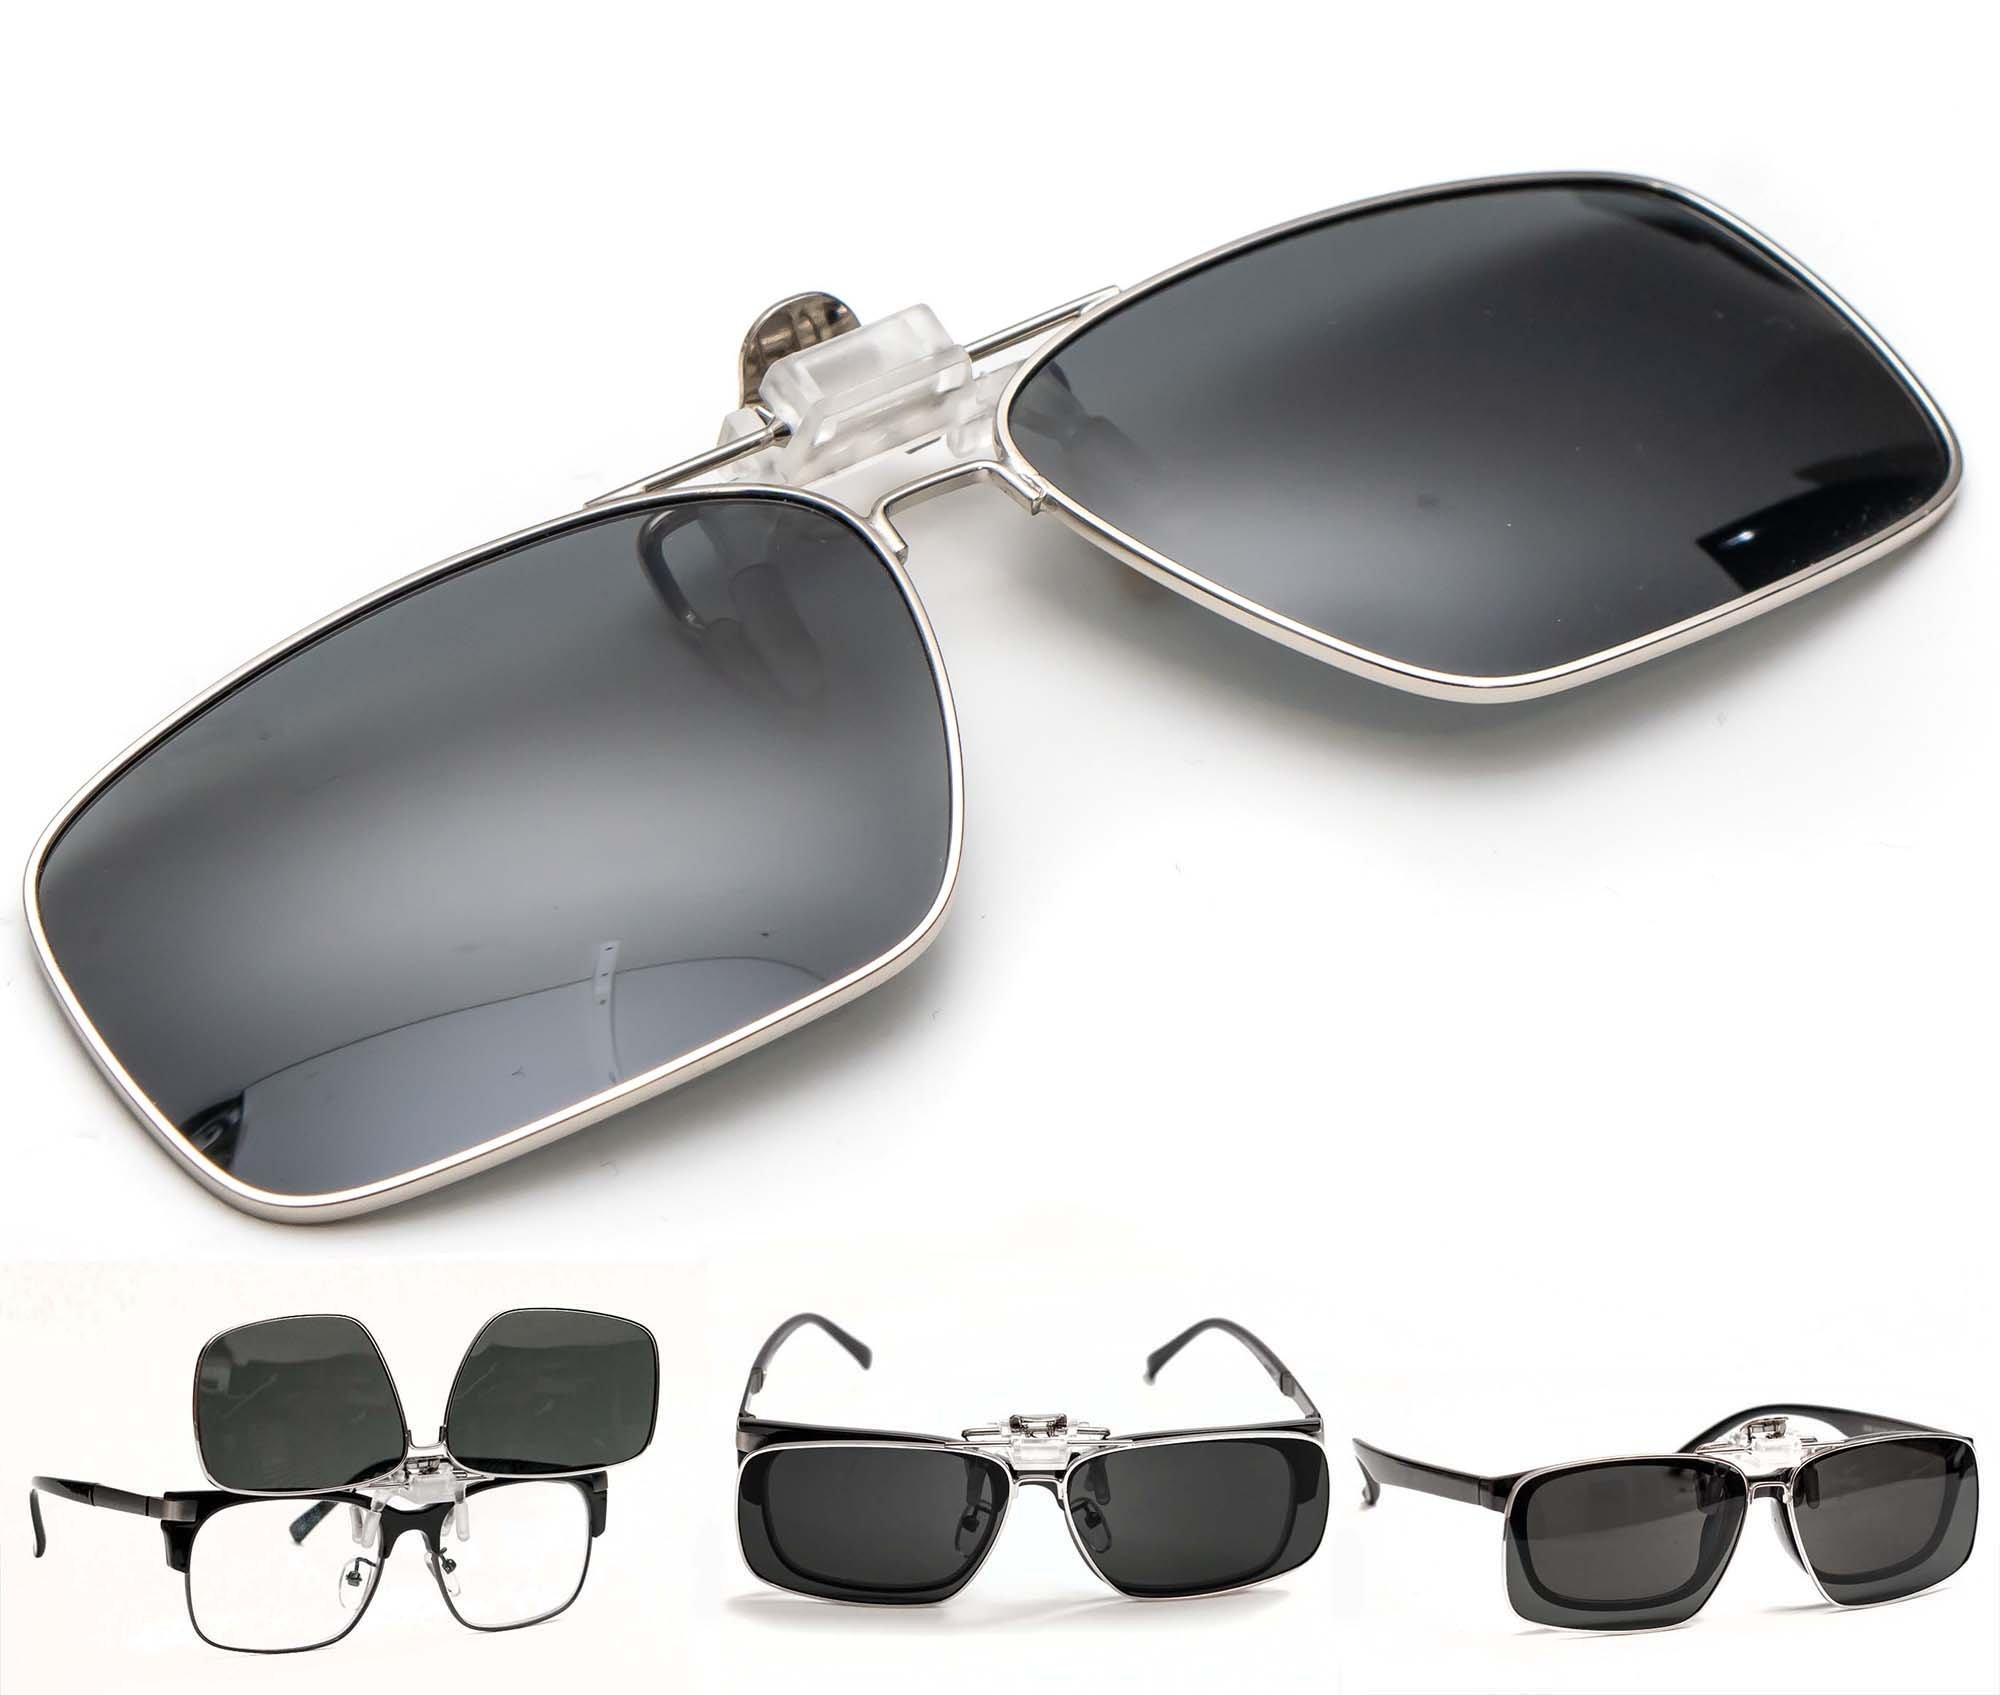 Metallic Rim Polarized Clip-on Driving Sunglasses with Flip Up Function, Anti-Reflective Anti-Glare UV400 UV Protection, Extra Large (Black)